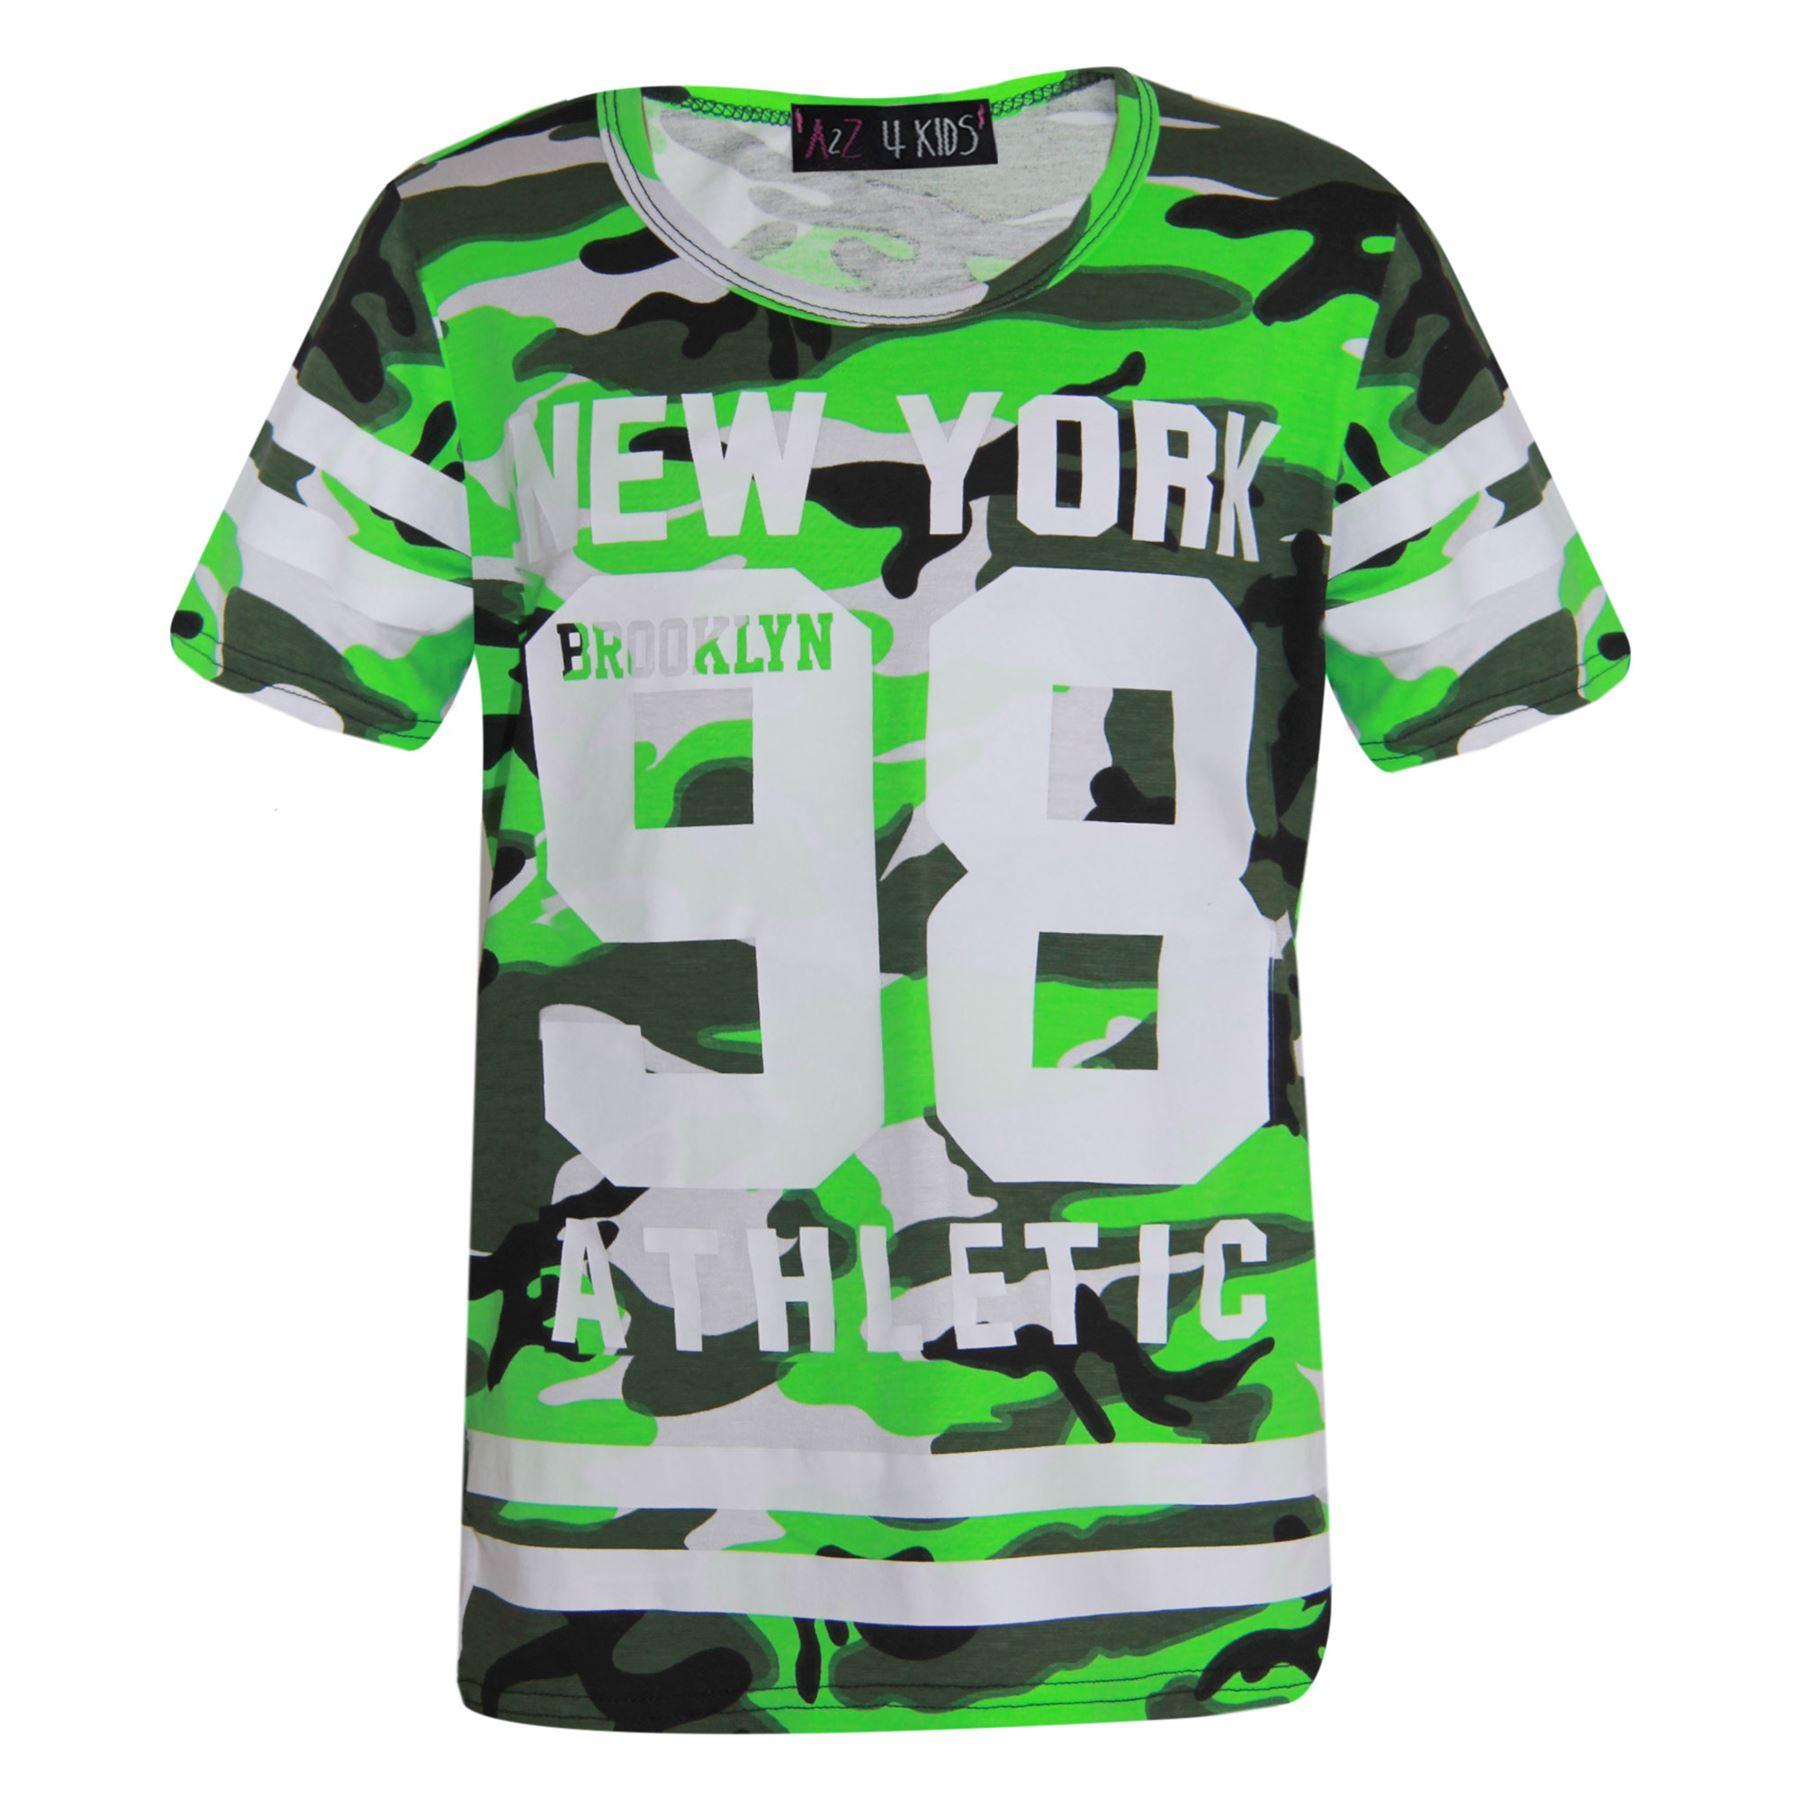 Girls-NEW-YORK-BROOKLYN-98-ATHLECTIC-Camouflage-Print-Top-amp-Legging-Set-7-13-Yr thumbnail 30